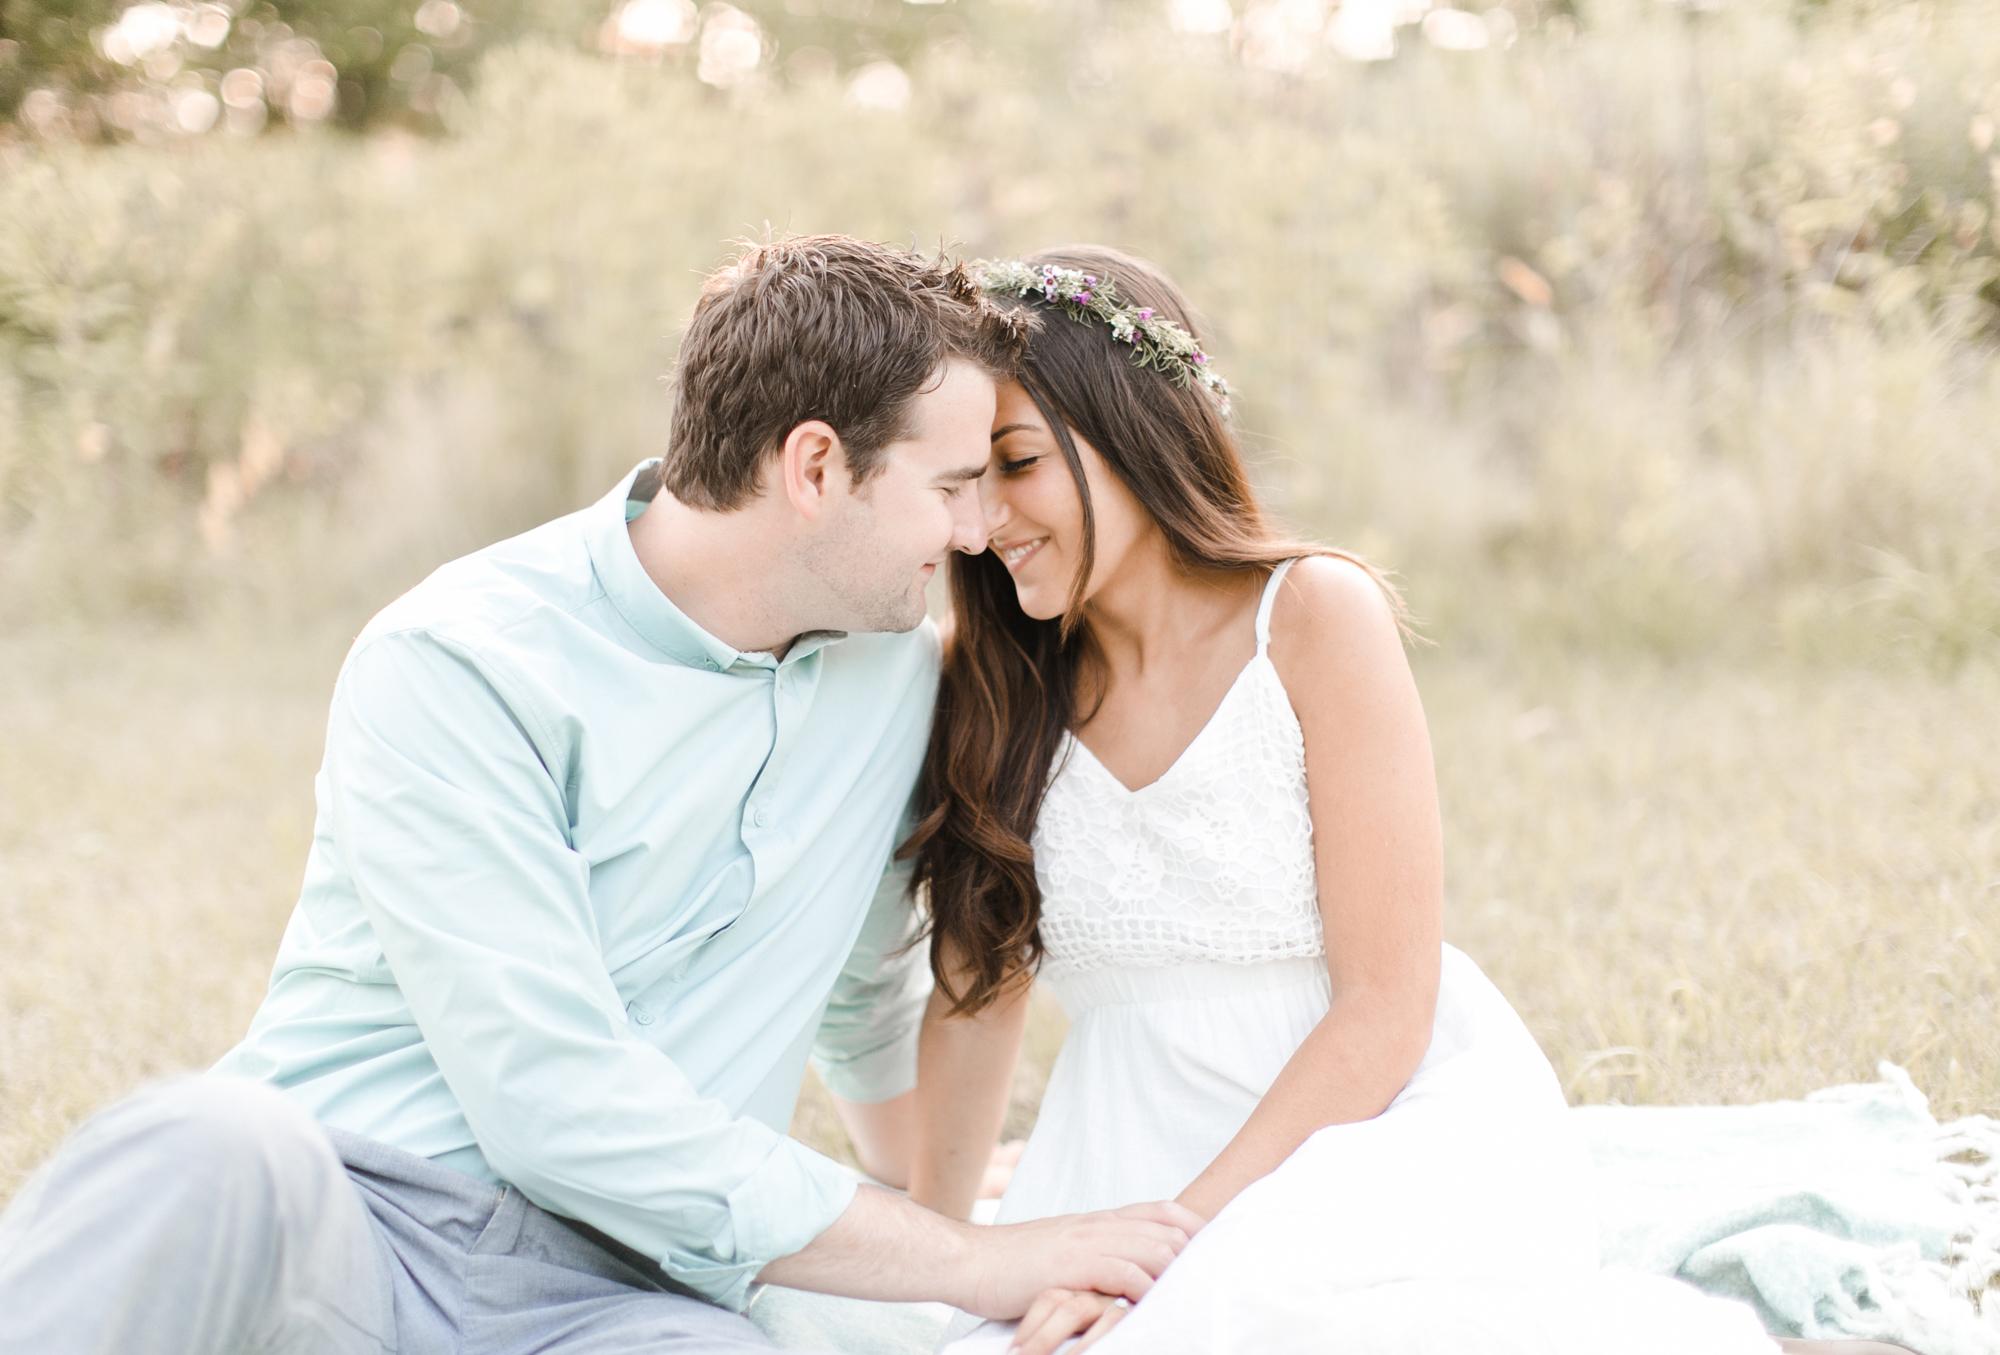 Chris&Marianne-Engagement-61.jpg